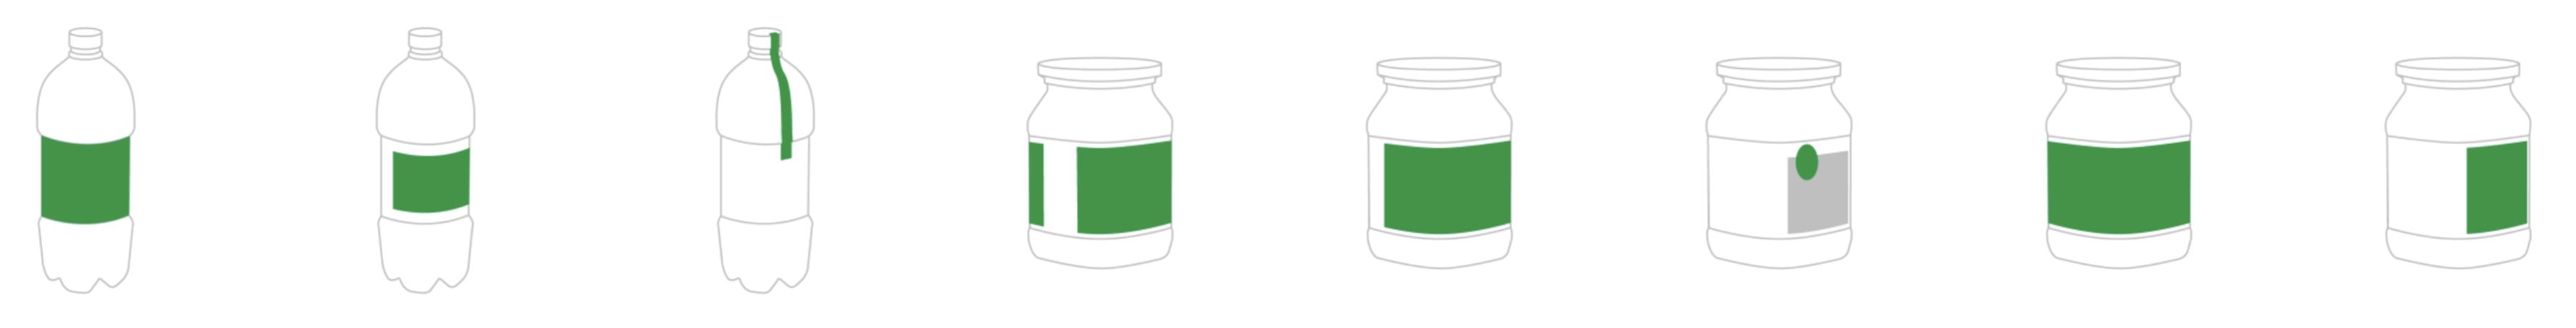 Langguth Combination Labeler